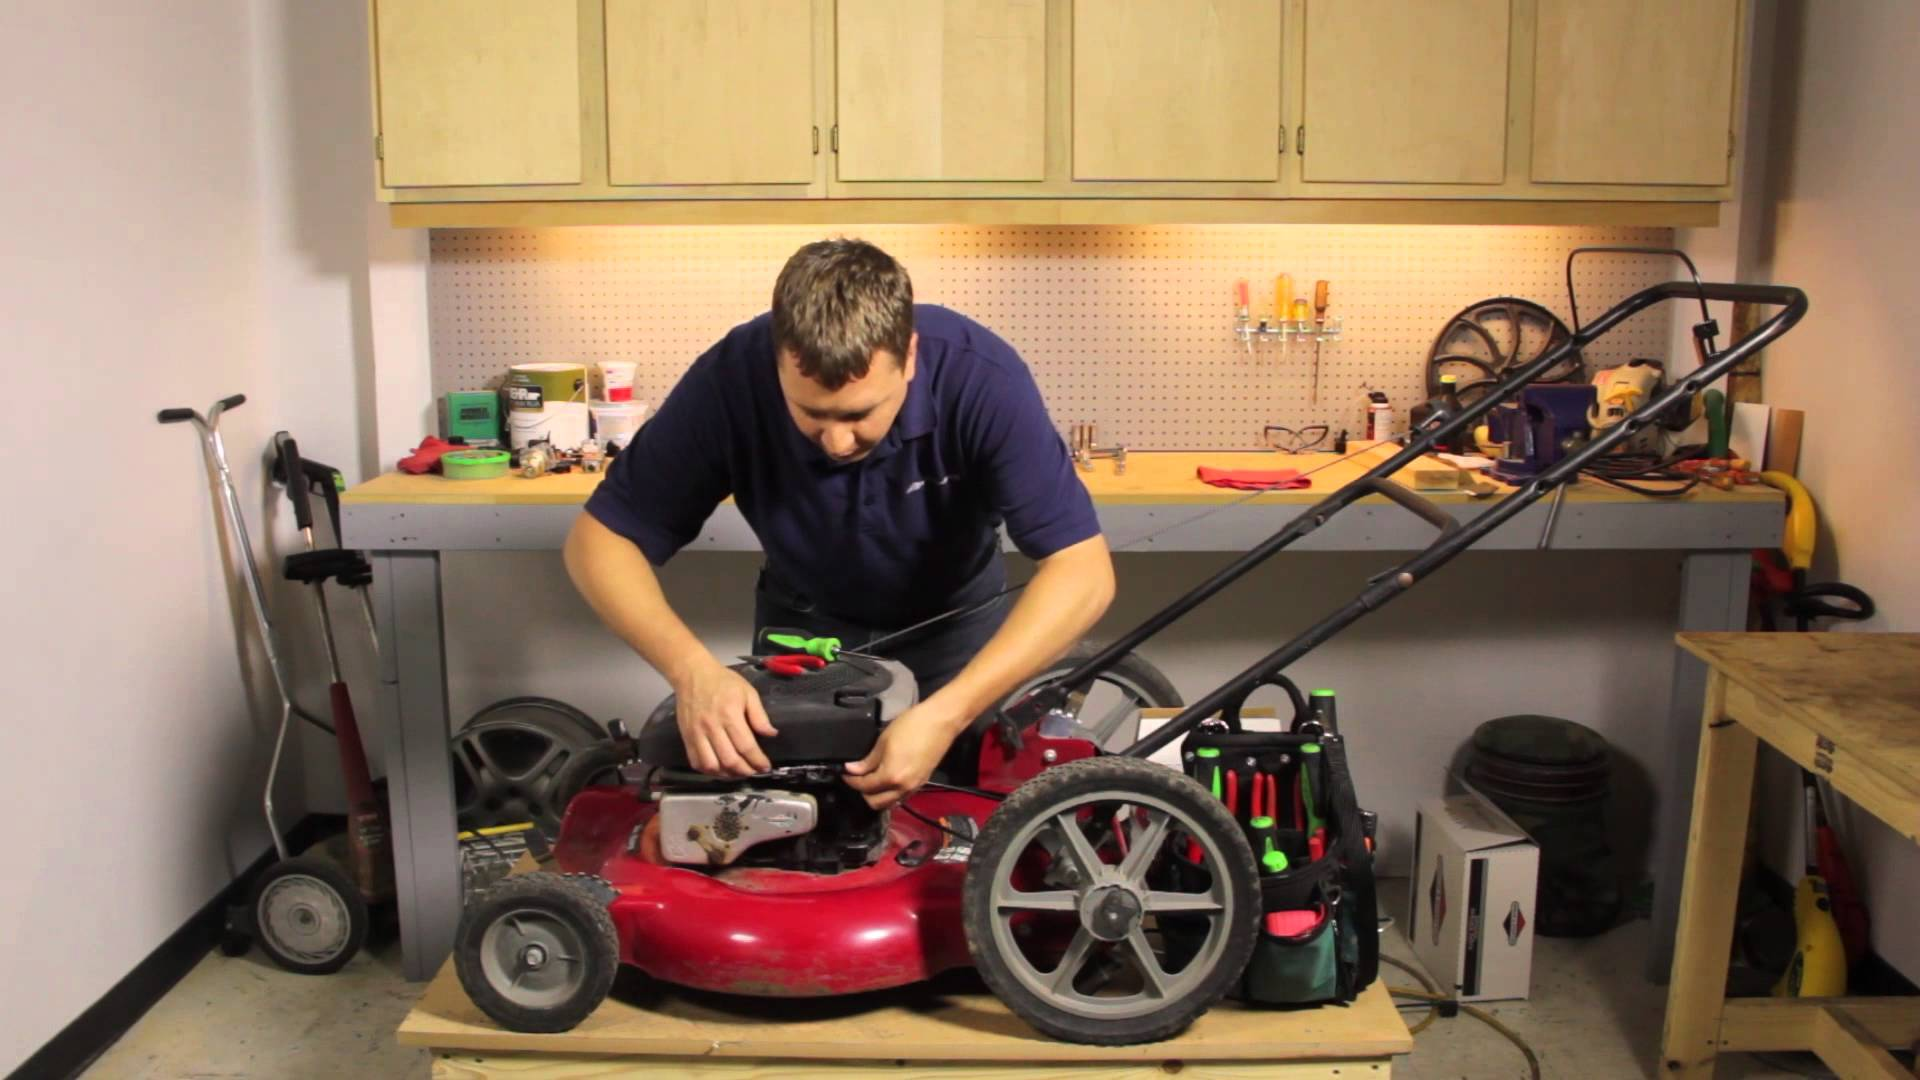 boston lawn mower maintenance